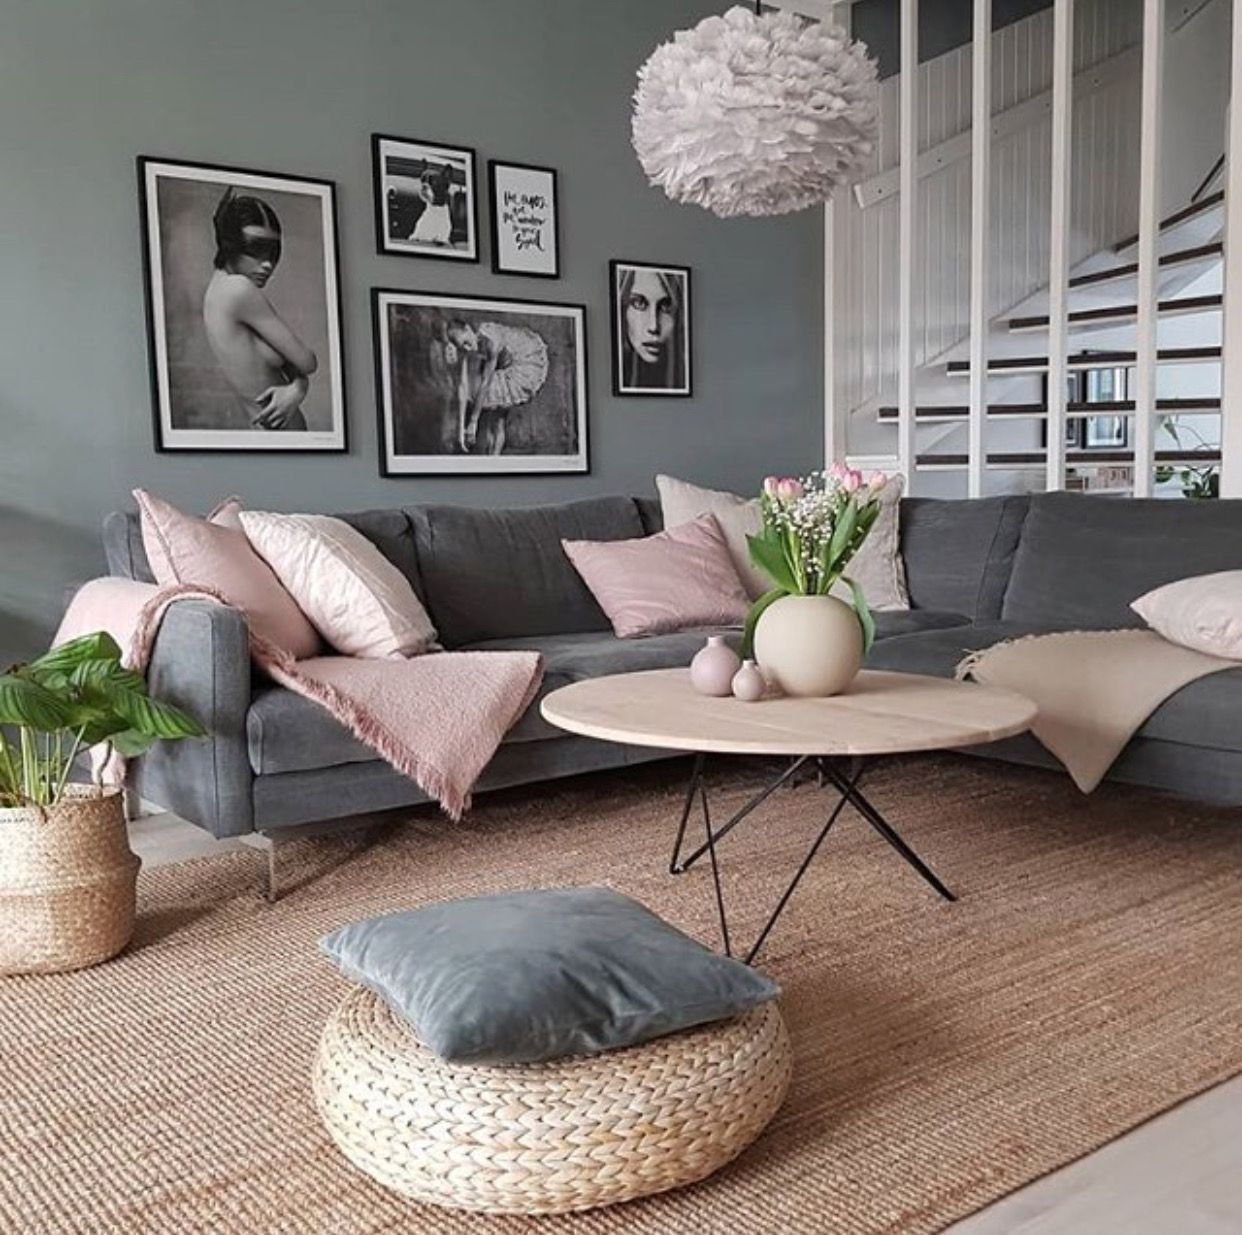 10000 Living Room Design Ideas Wayfair 520045 Room Decor Ideas Roomdecorideas Antique In 2020 Small Living Rooms Holiday Living Room Living Room Scandinavian